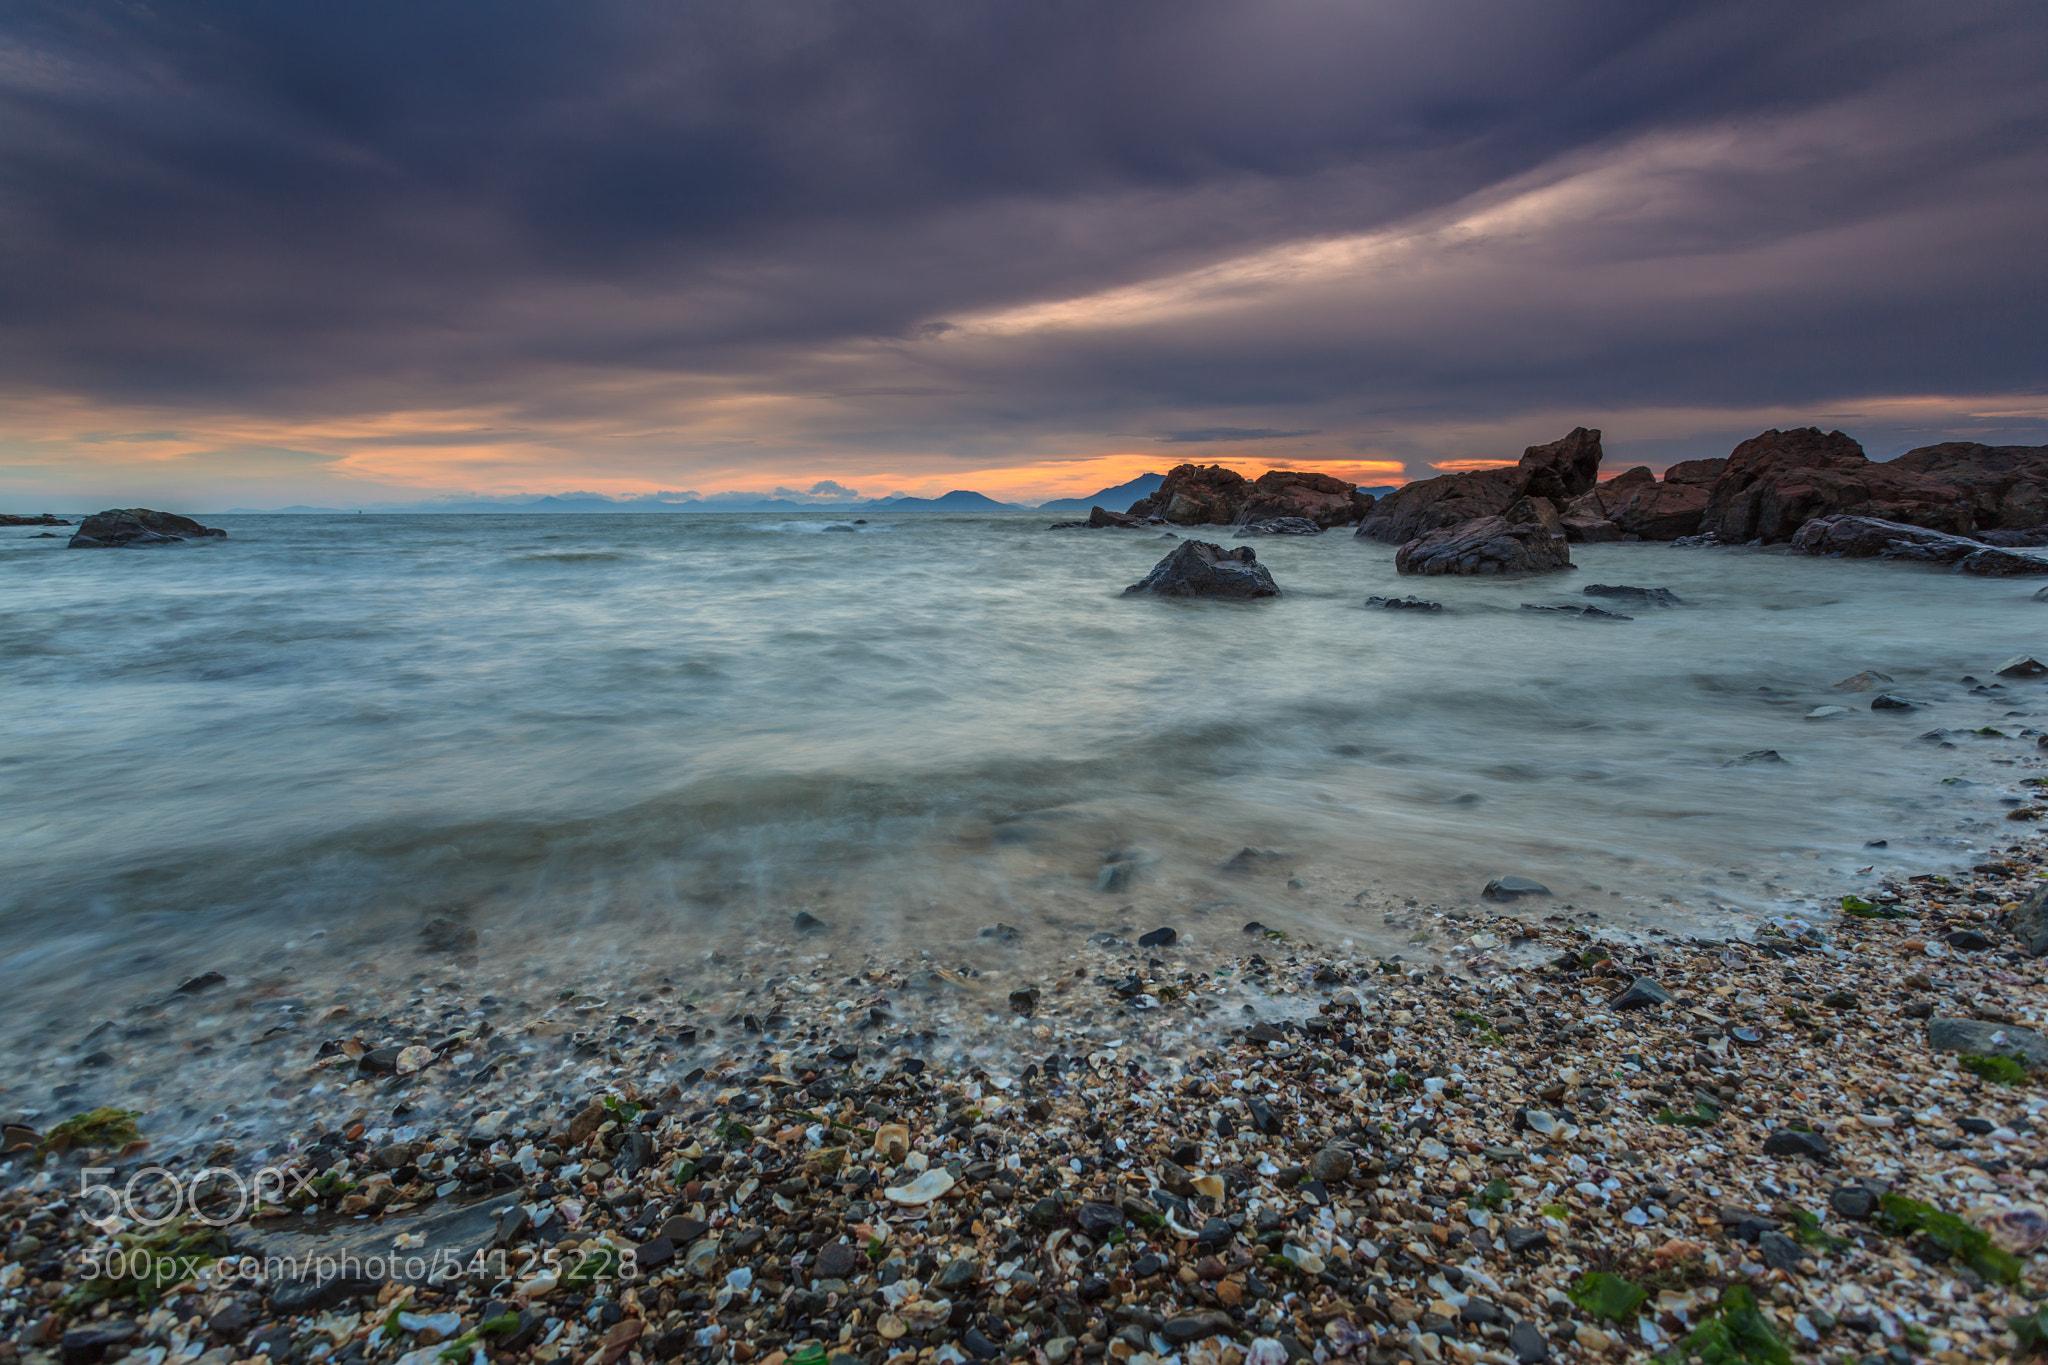 Photograph Sunset at Dadaepo by Emelianenko Dmitrii on 500px